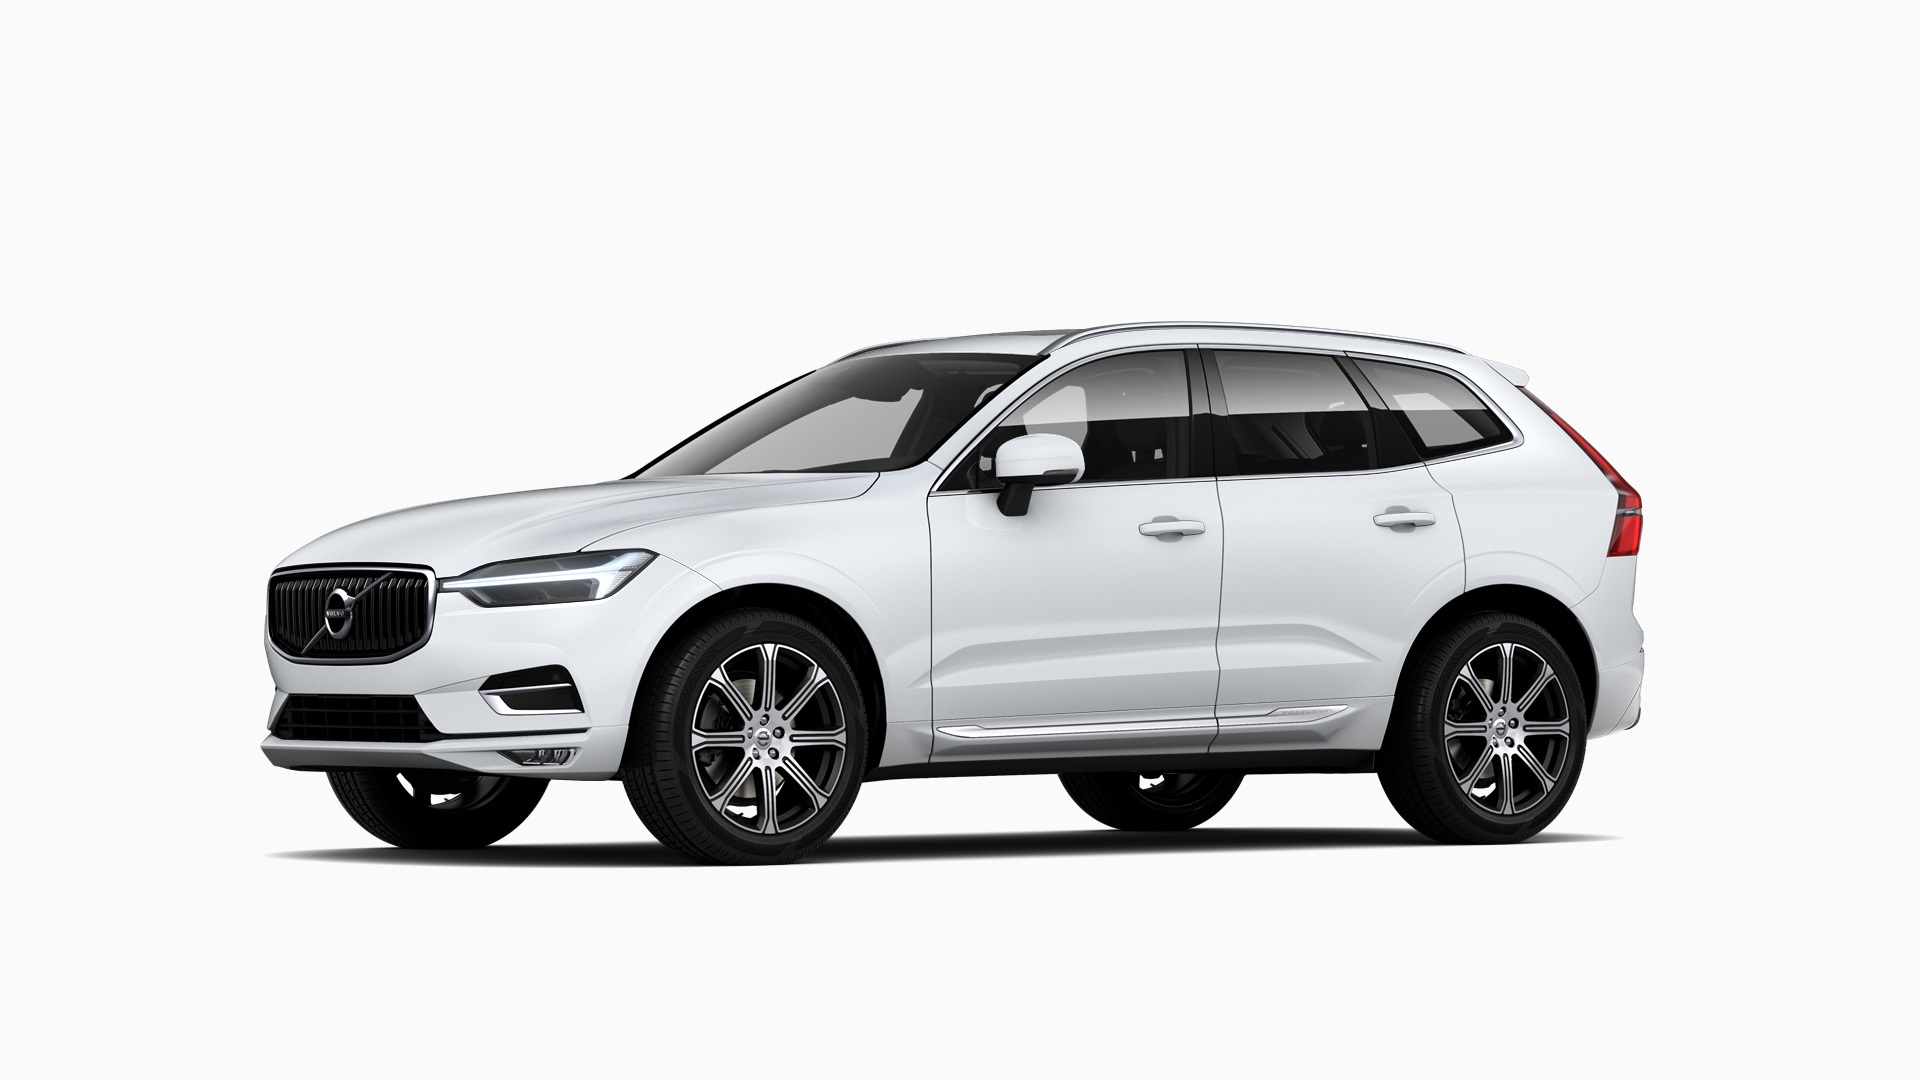 2019 Volvo XC60 T6 AWD Inscription - 1804409 - Capitol Motors